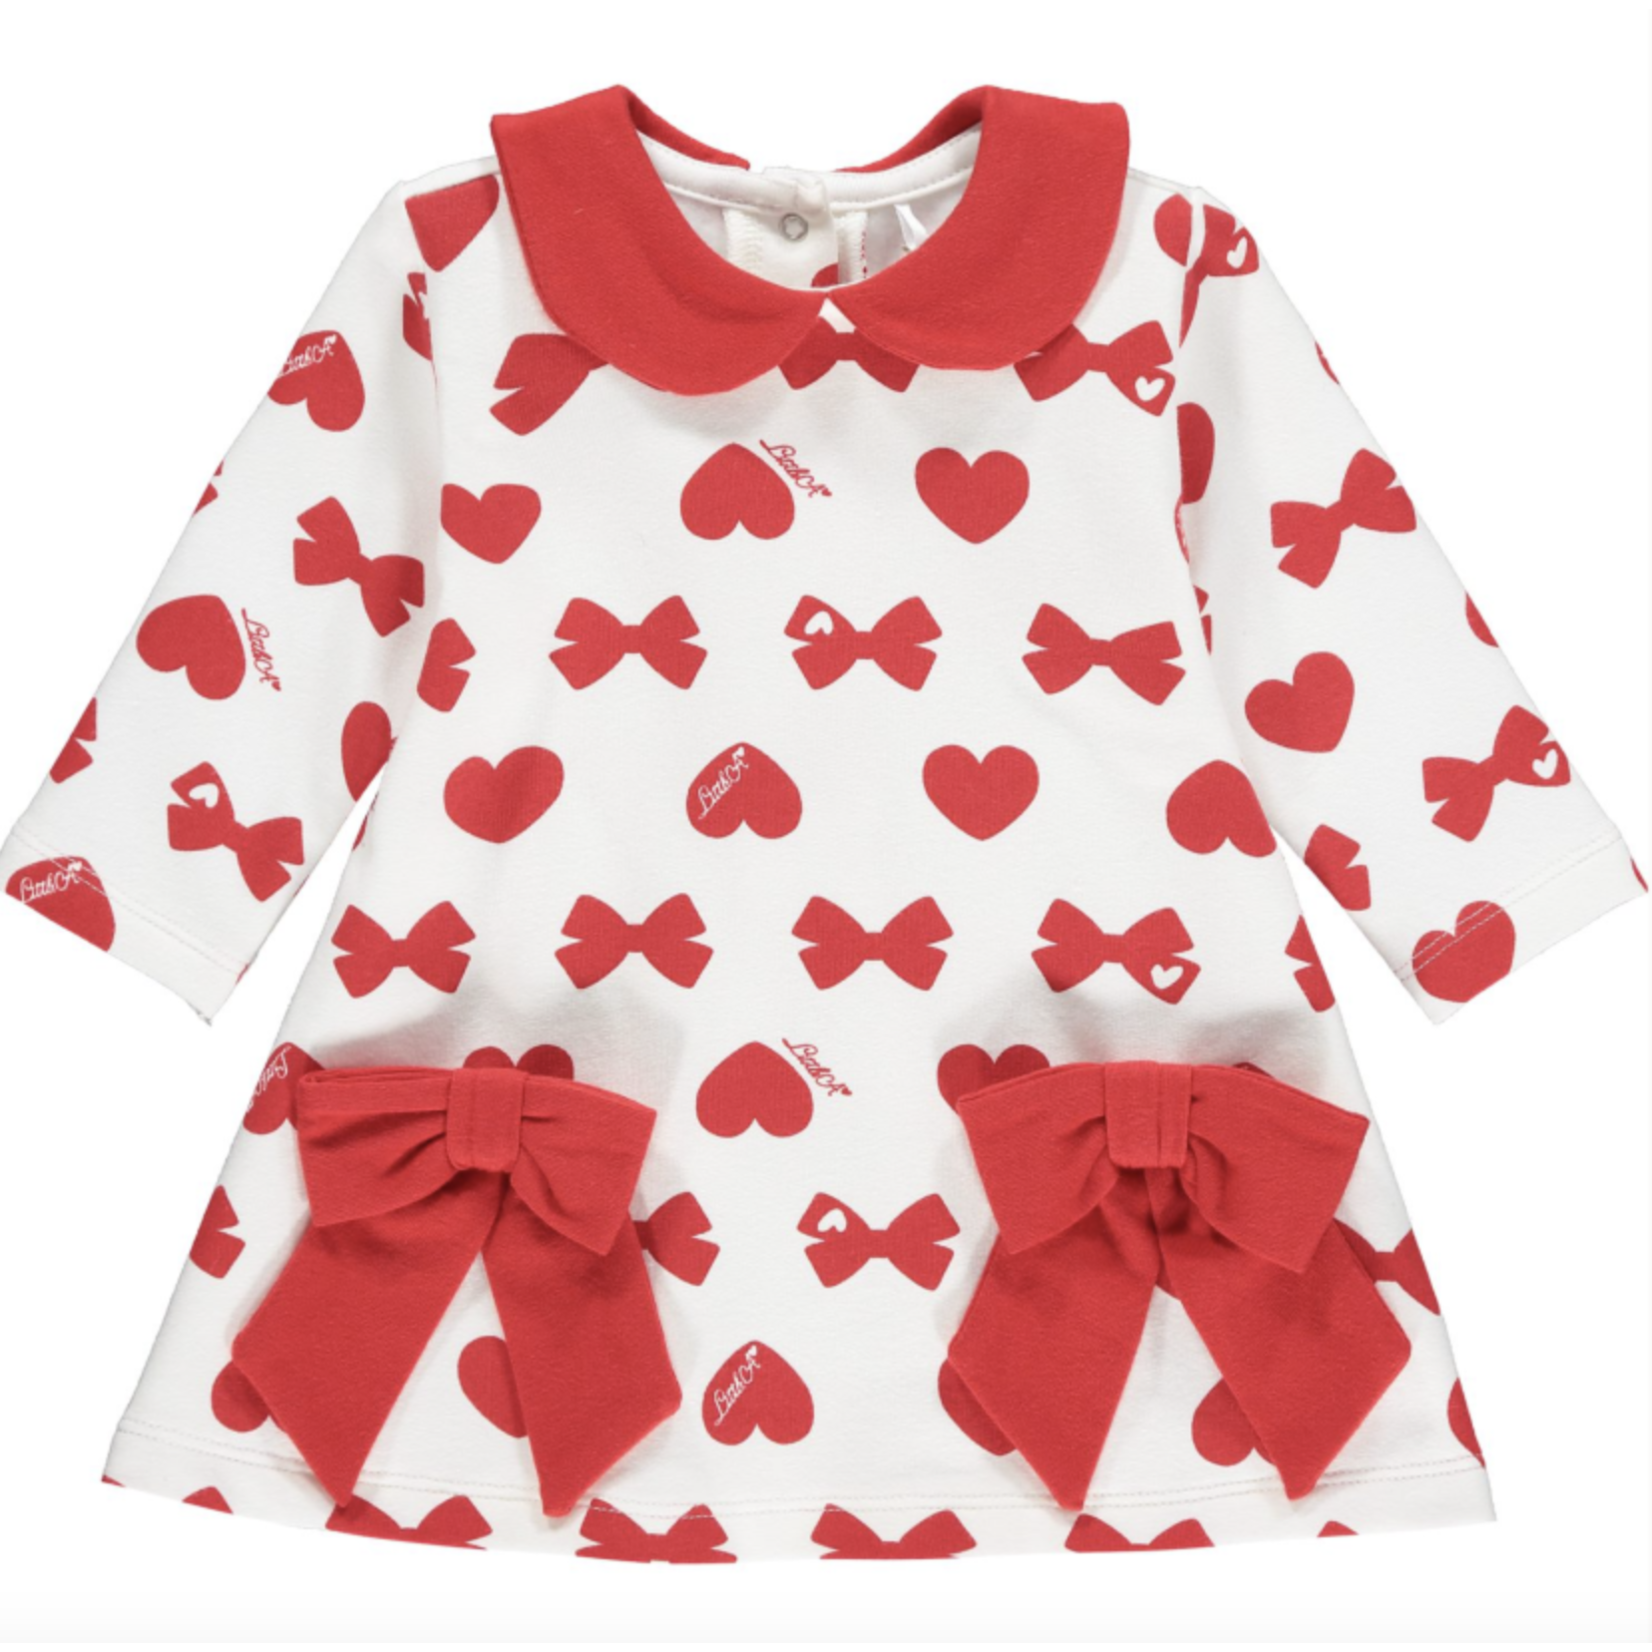 Little A'dee Bows & Hearts print dress